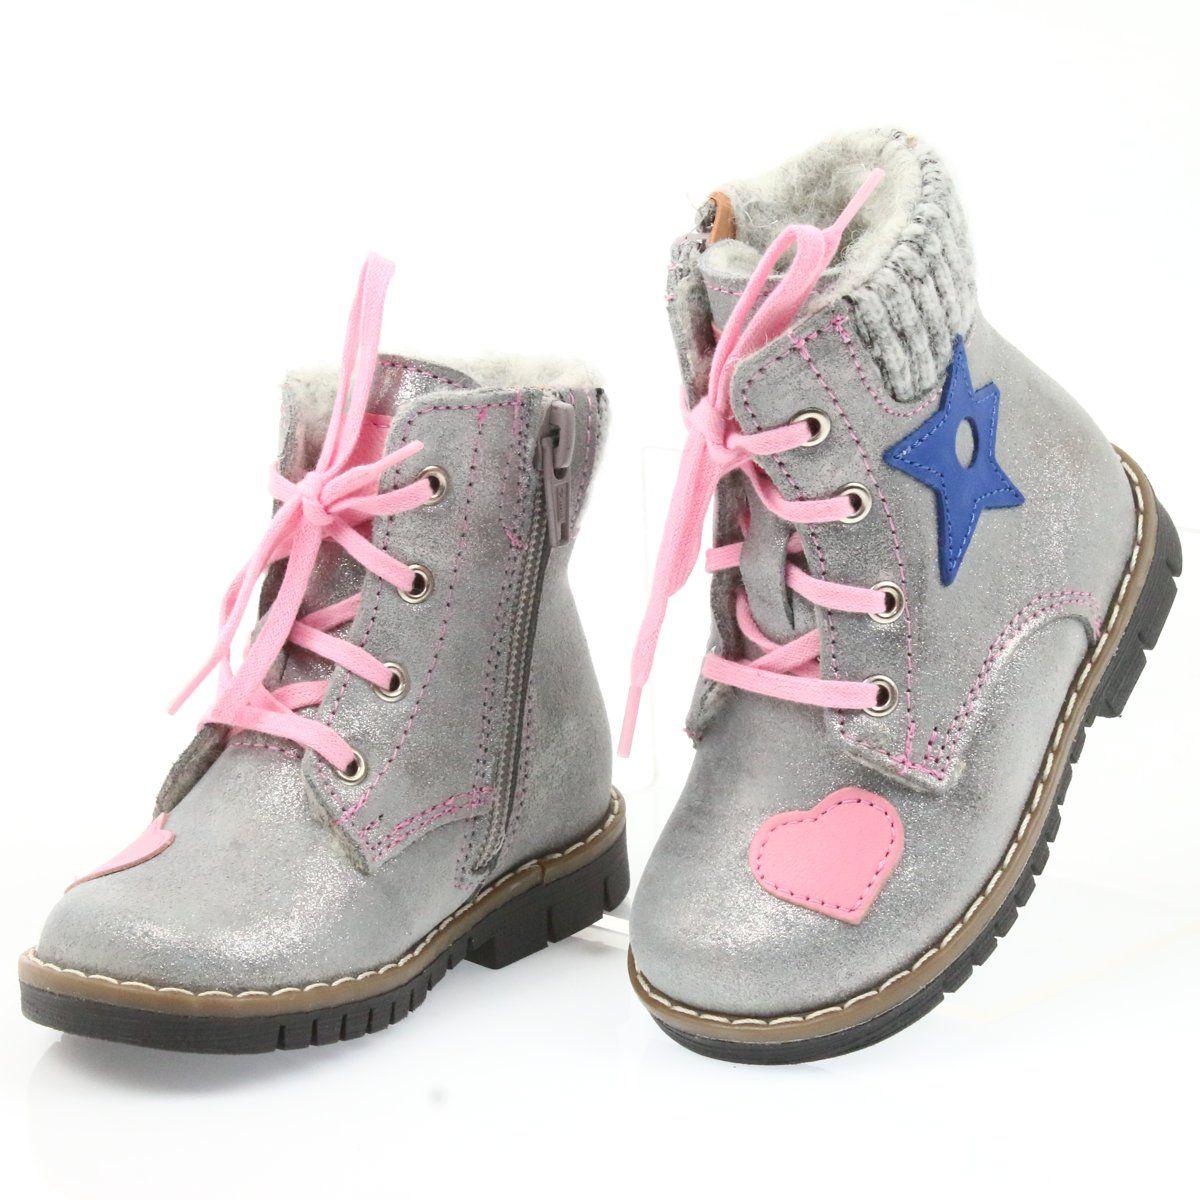 Kozaczki Timberki Ren But 1508 Szare Combat Boots Boots Hiking Boots